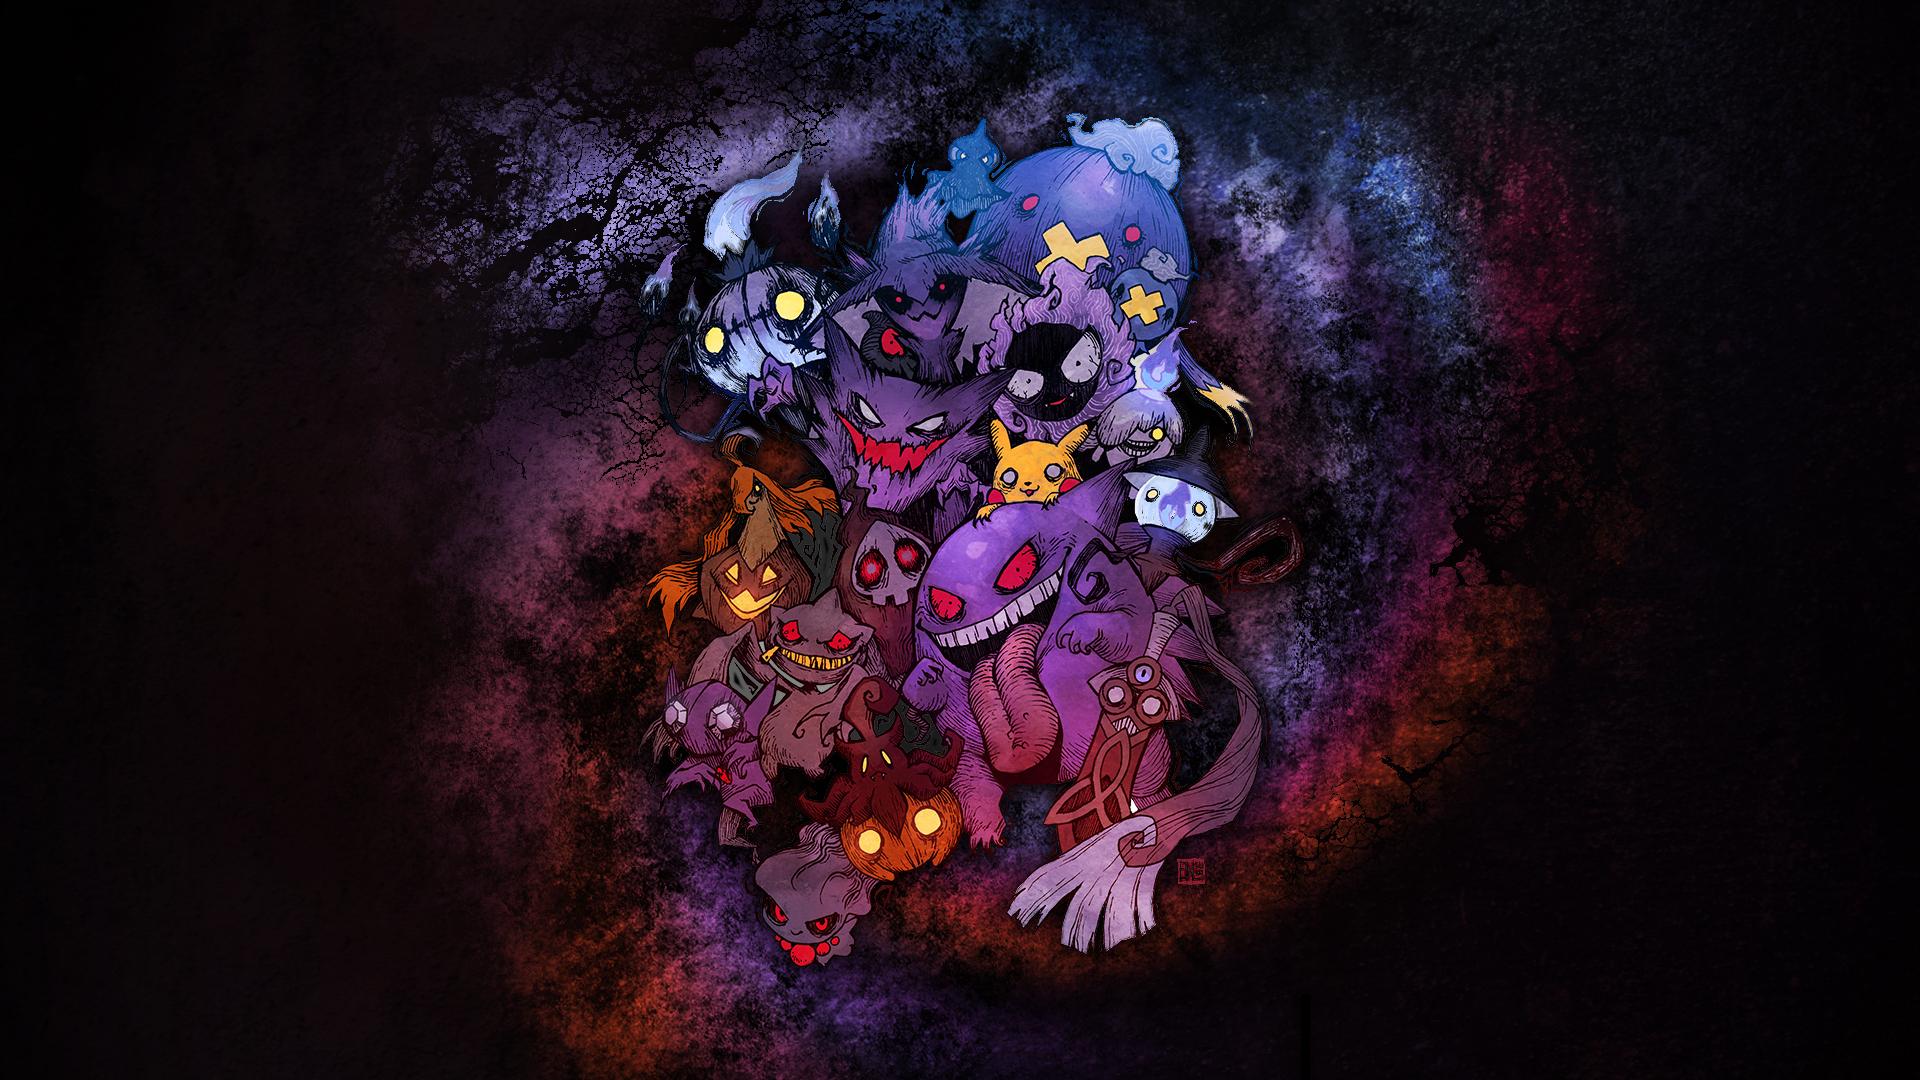 Scary Pokemon Wallpaper Ghost Pokemon Wallpaper Hd